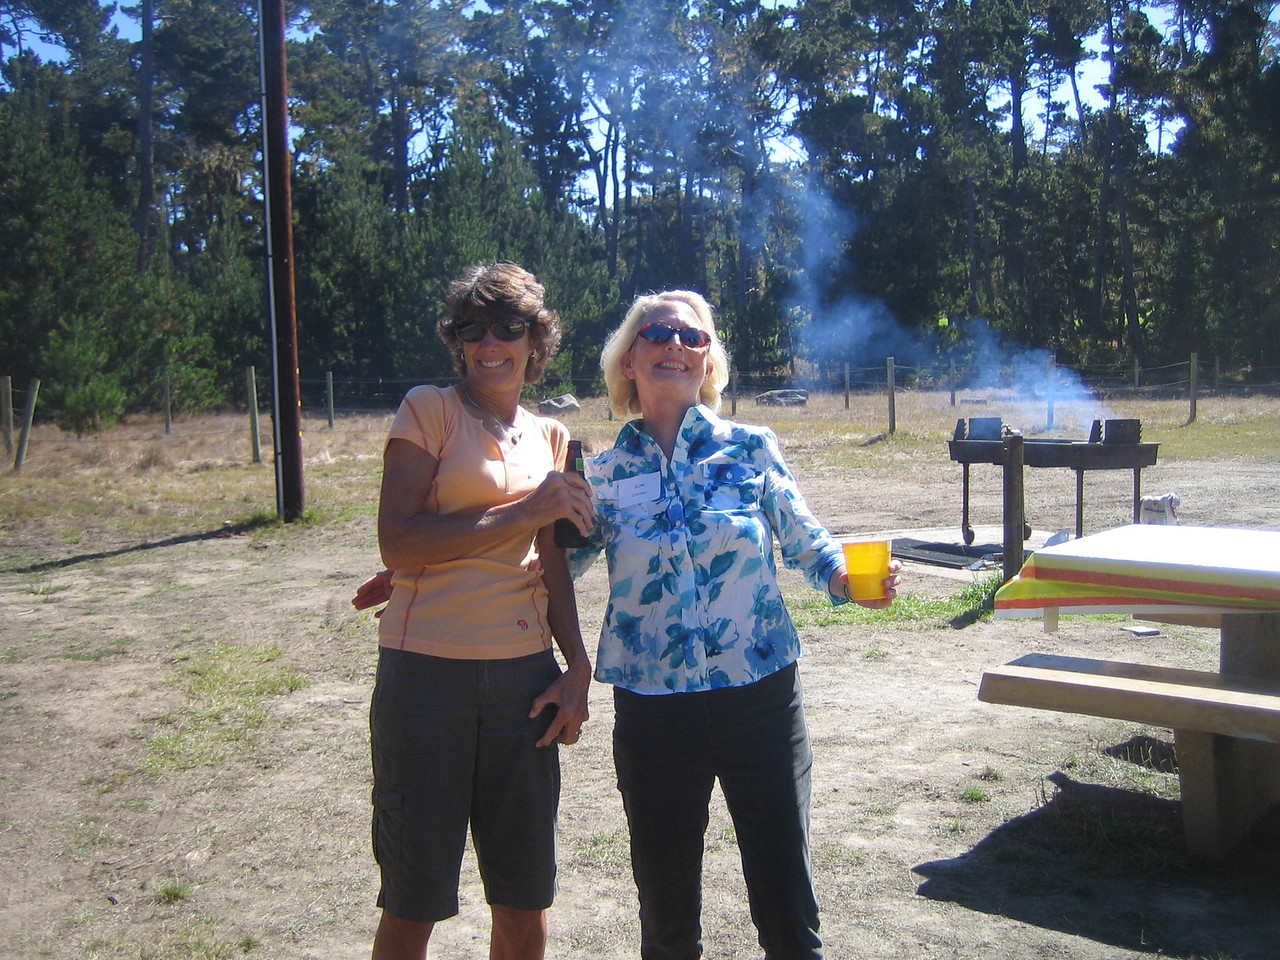 Christine Olson and Kim Caneer strike a pose.